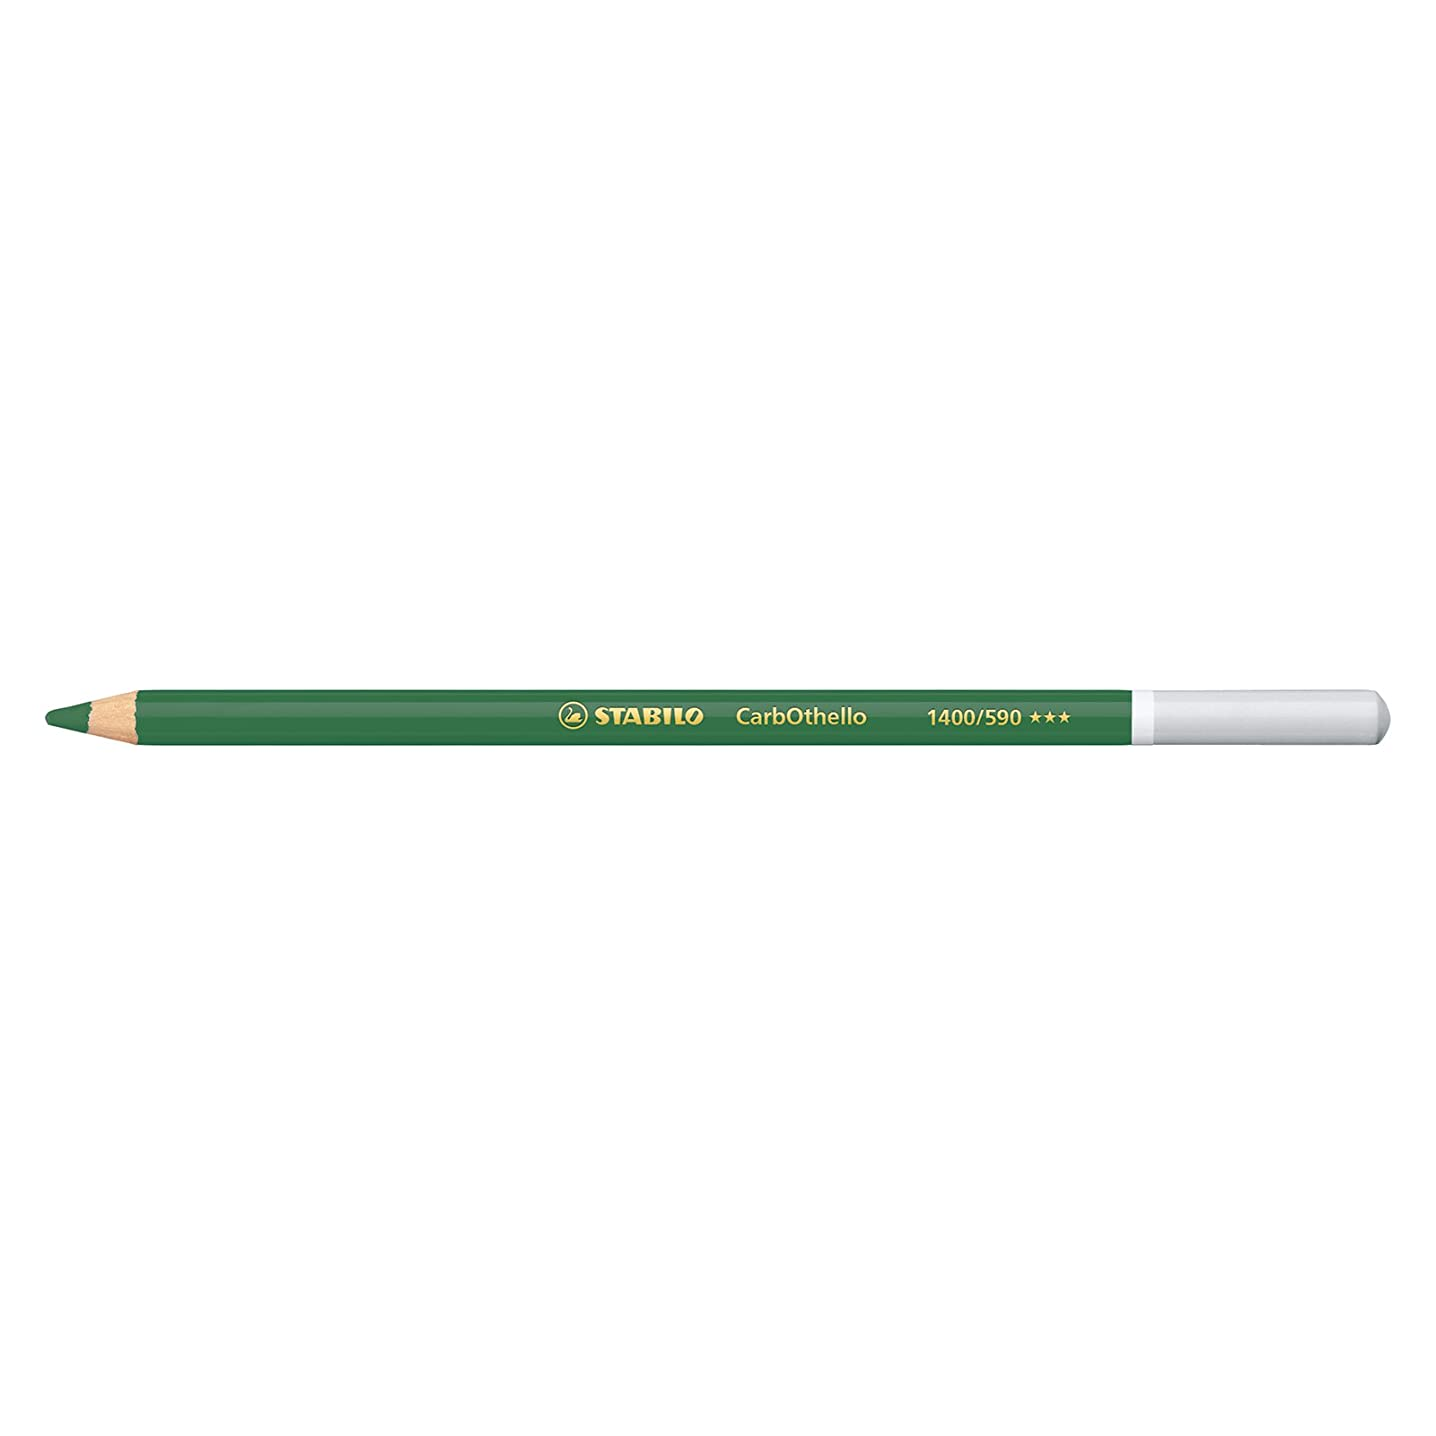 Stabilo CarbOthello Pastel Pencil, Viridian Matte